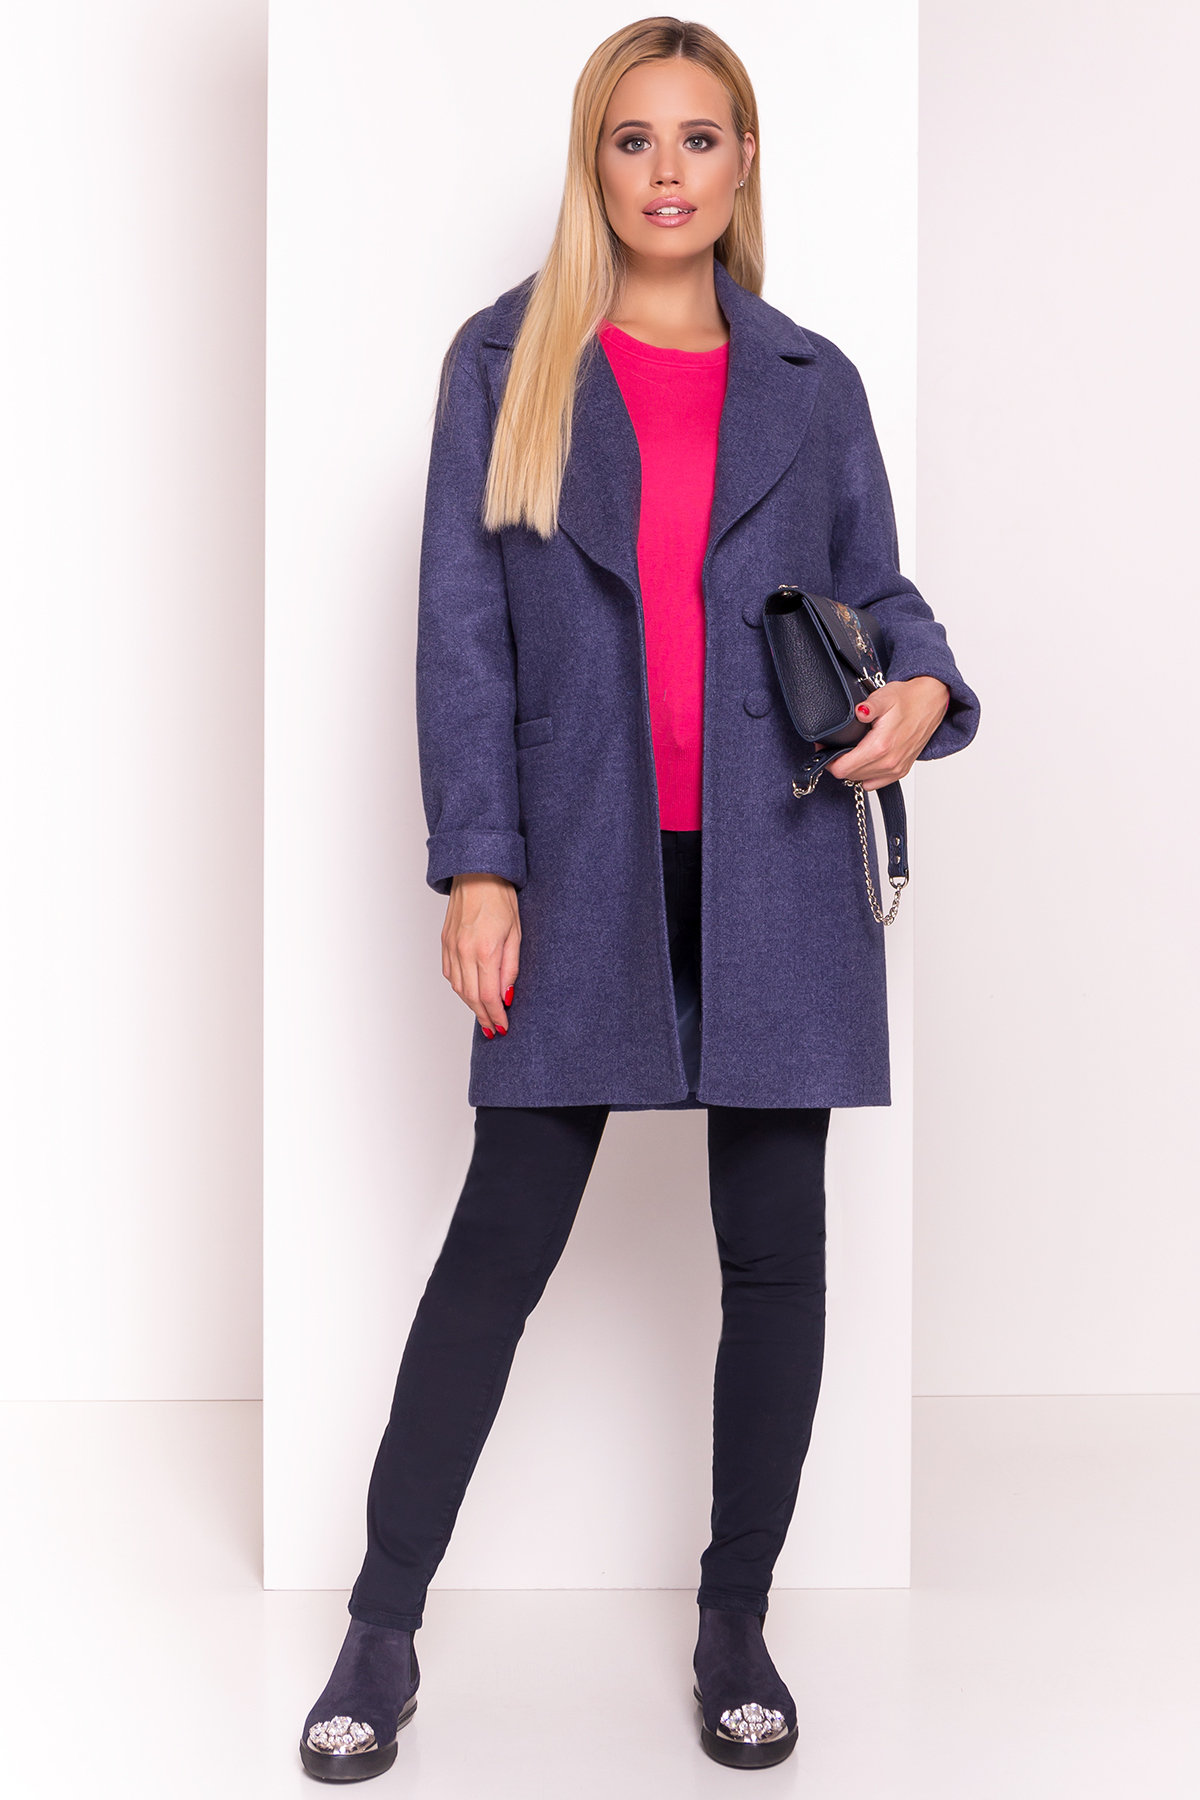 Пальто Вива 4558 АРТ. 37263 Цвет: Джинс - фото 1, интернет магазин tm-modus.ru